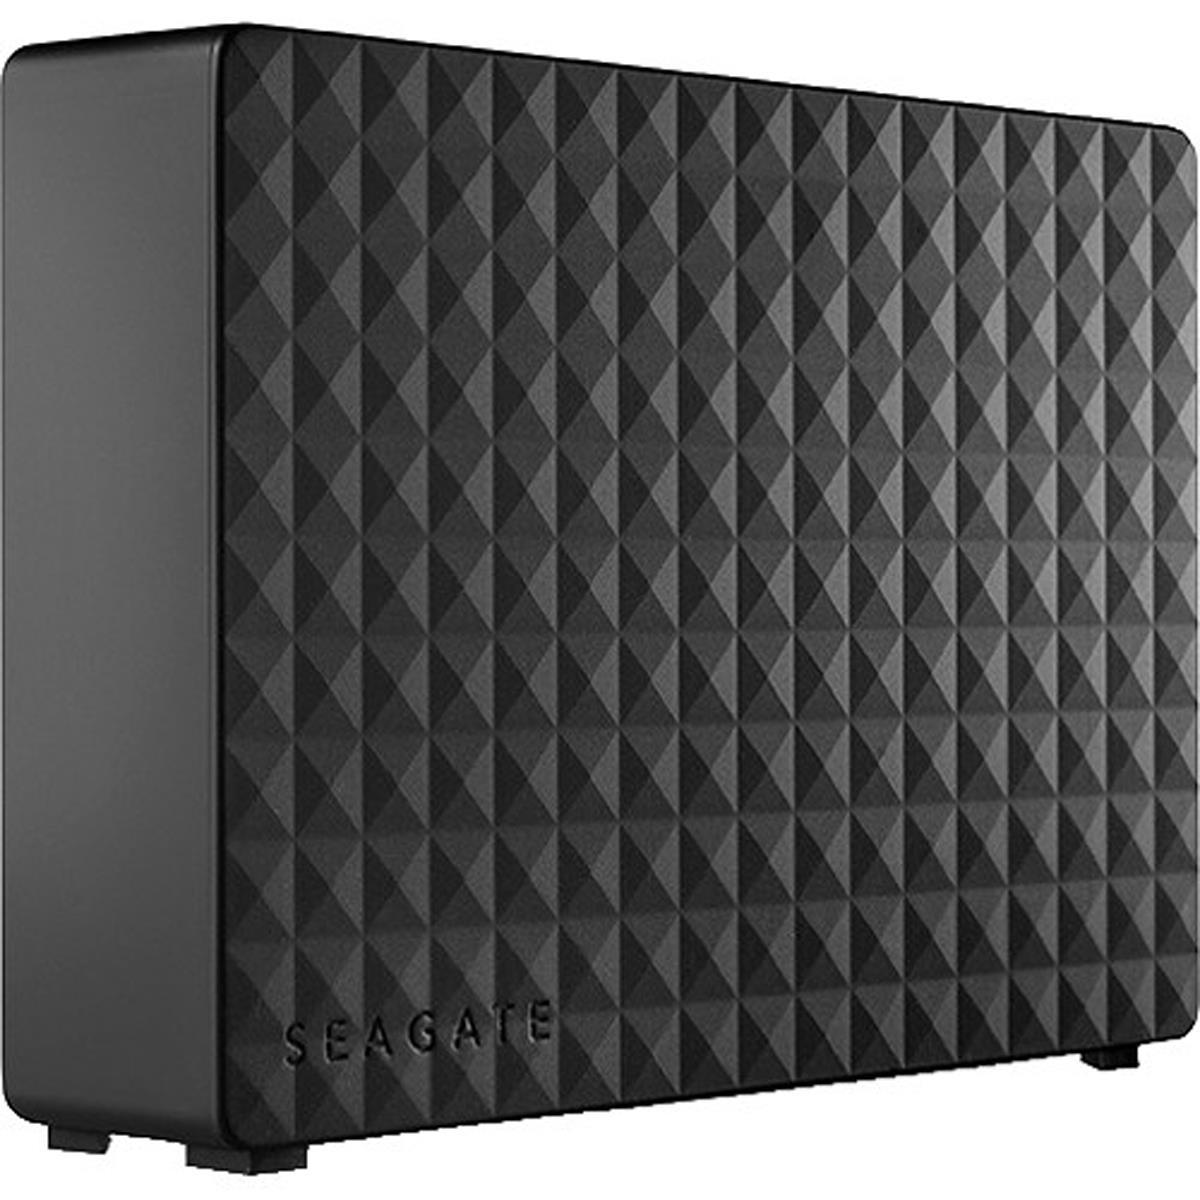 Seagate Expansion 12TB USB 3.0 External Desktop Hard Drive